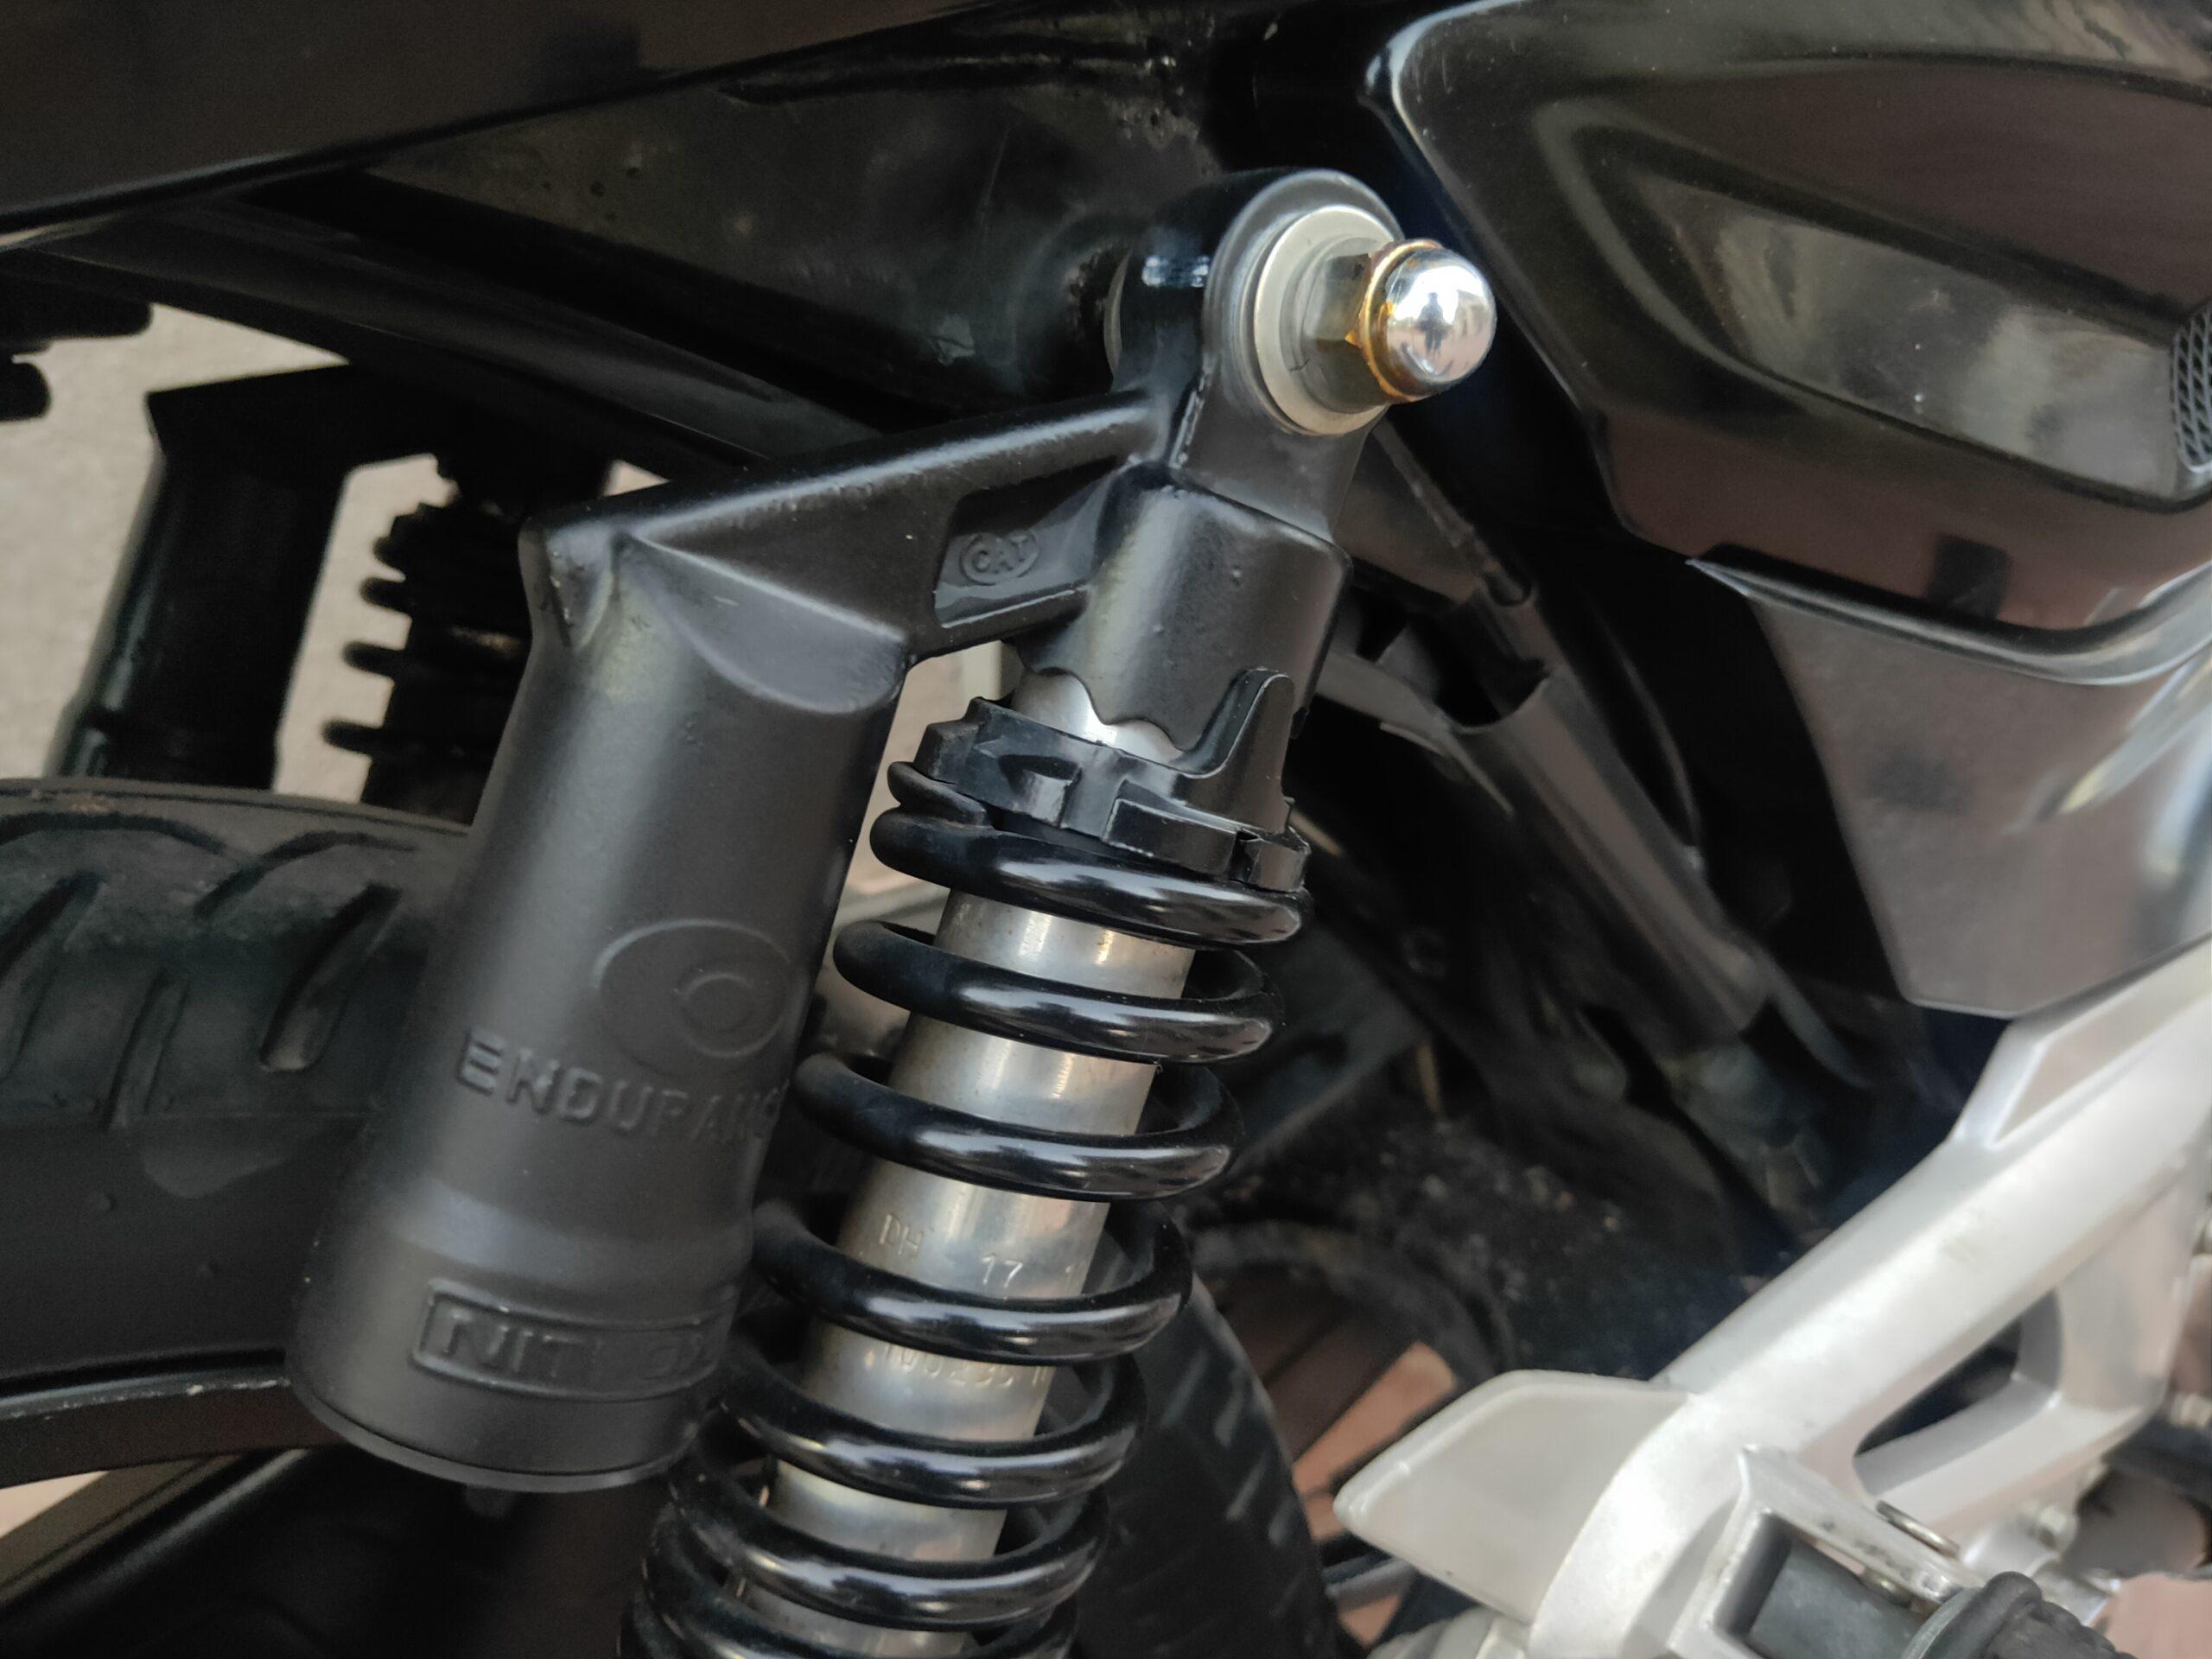 Adjustable Rear Shock Absorber